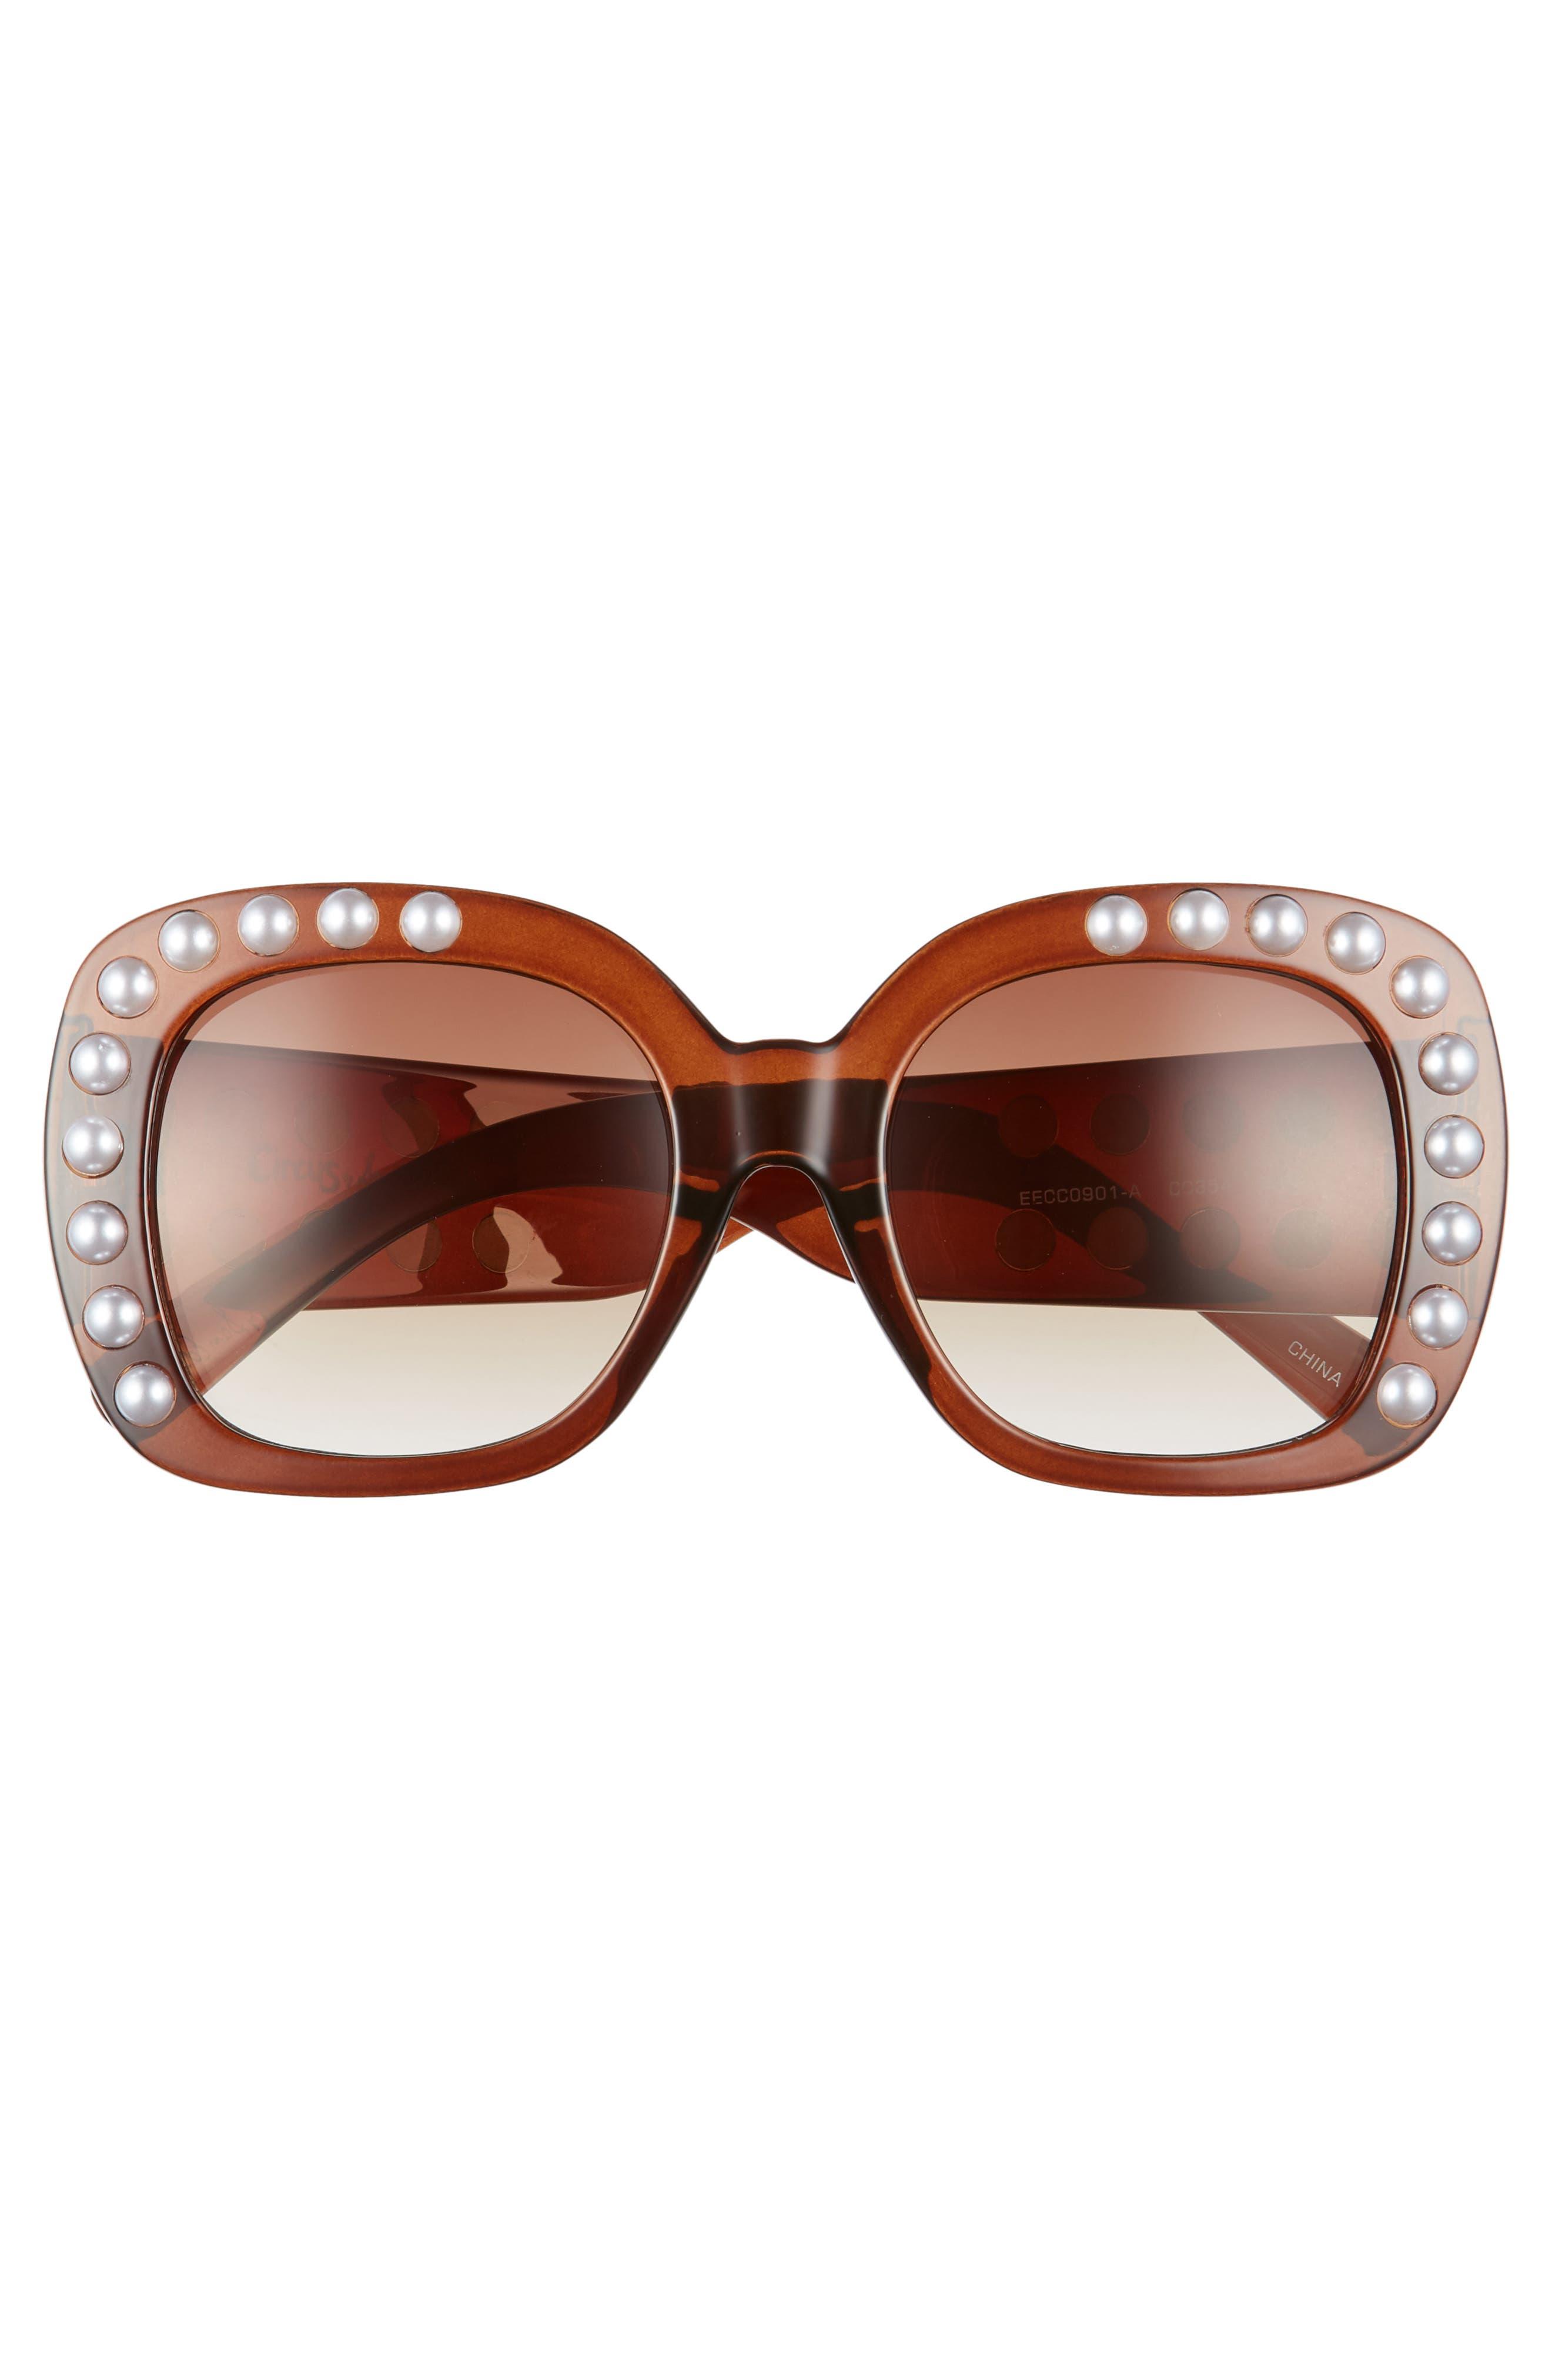 53mm Imitation Pearl Sunglasses,                             Alternate thumbnail 3, color,                             Brown